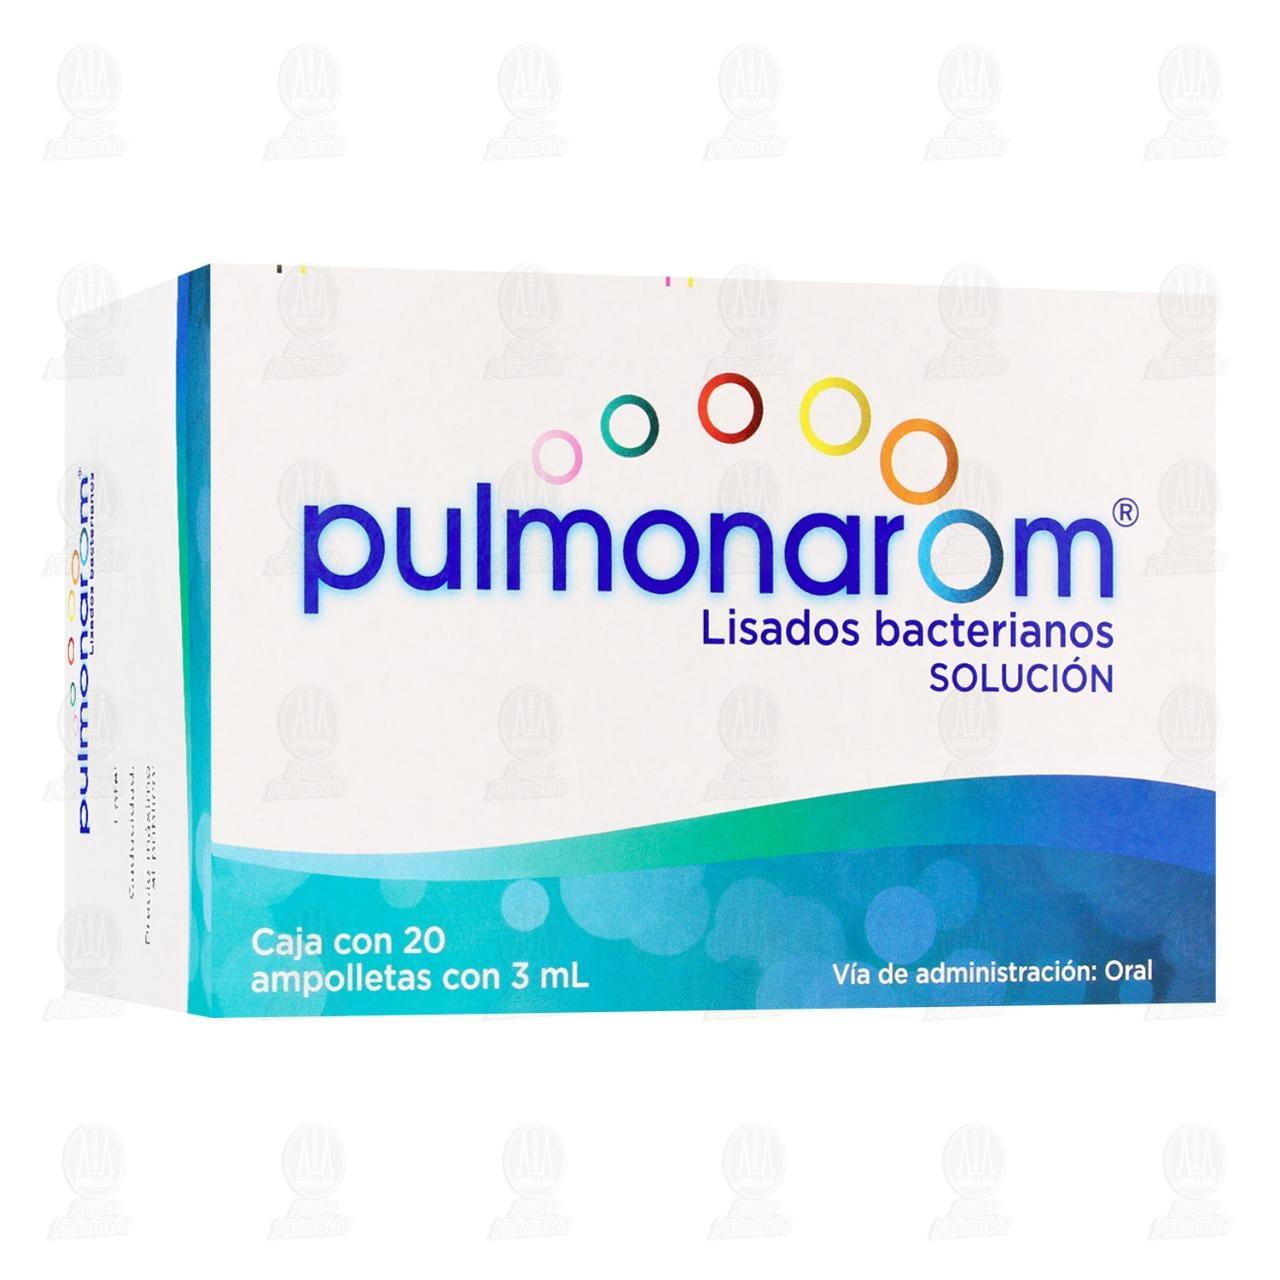 Pulmonarom Solución Ingerible 3ml Ampolletas Caja con 20